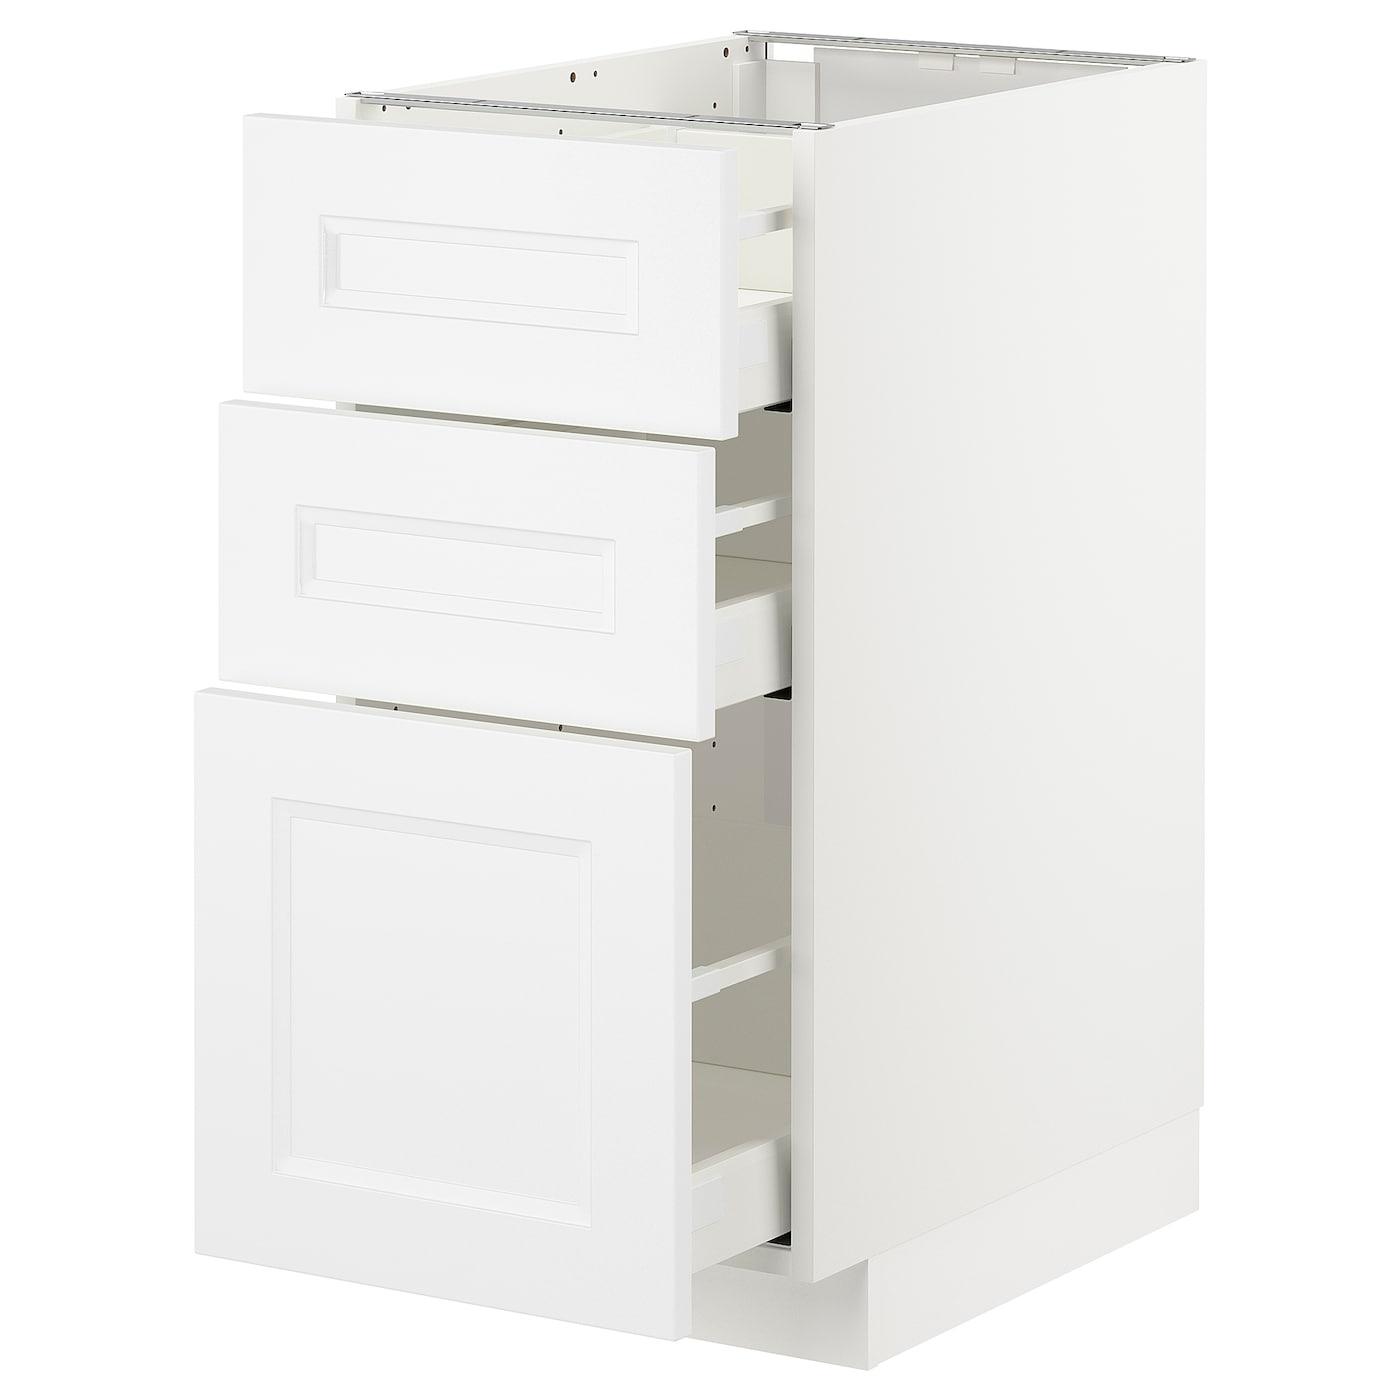 METOD Élément bas 11 tiroirs - blanc/Axstad blanc mat 11x11 cm